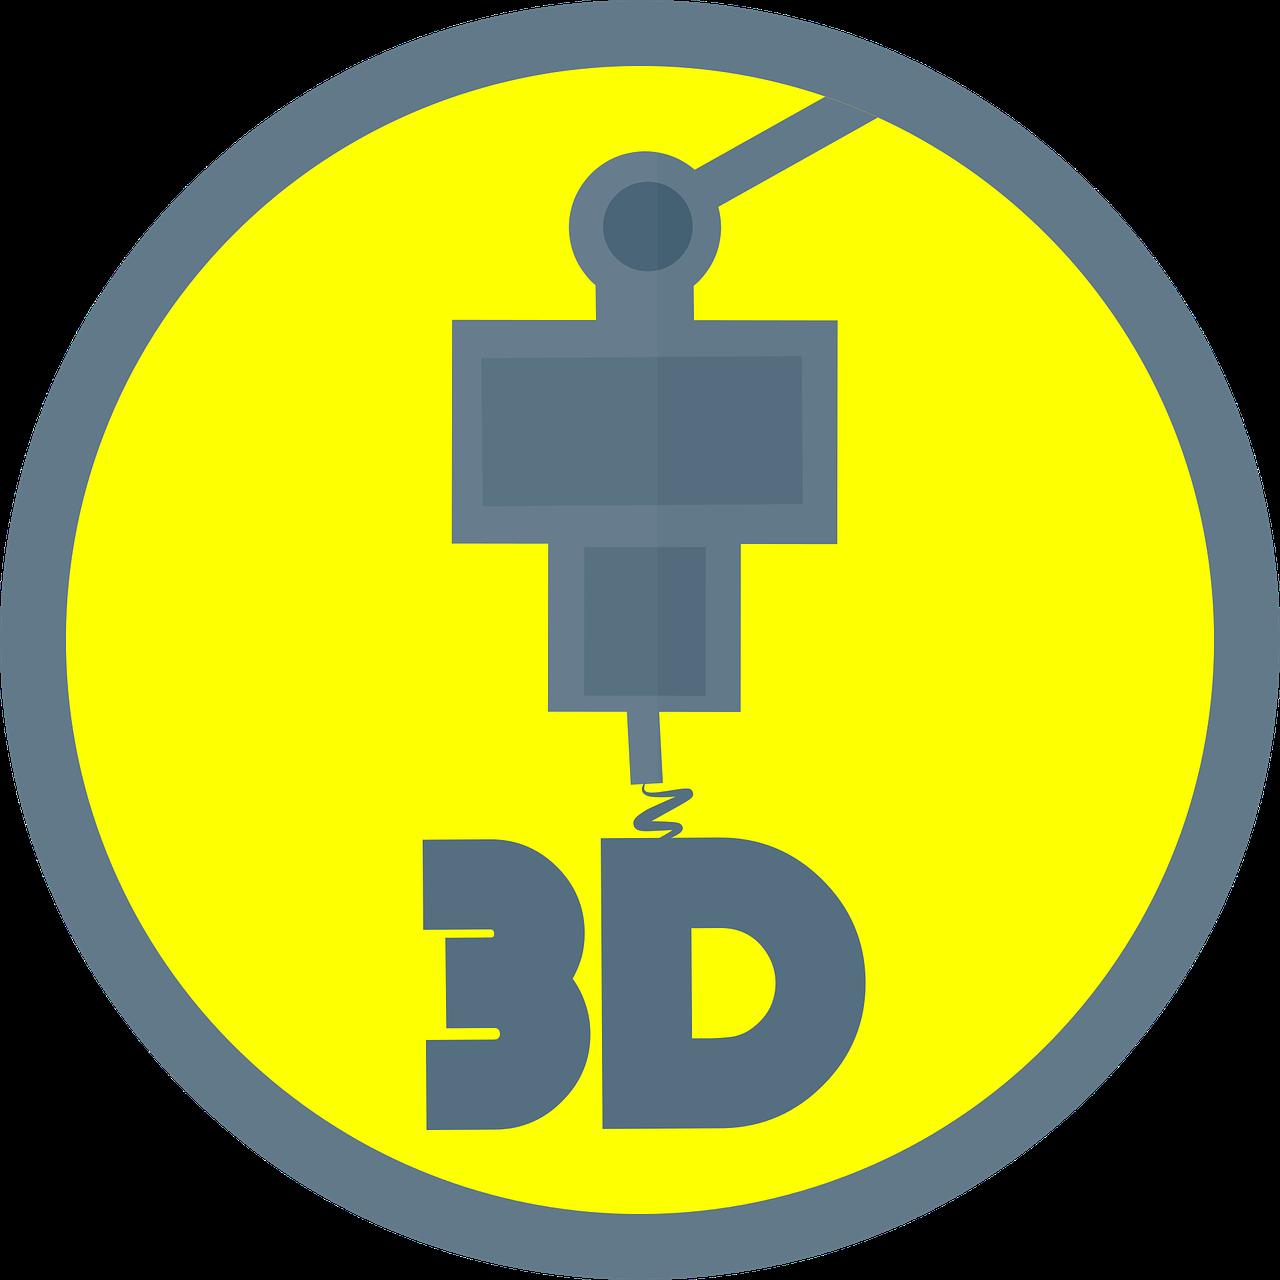 canaldeempresas.com--Impresoras 3D están transformando el vuelo